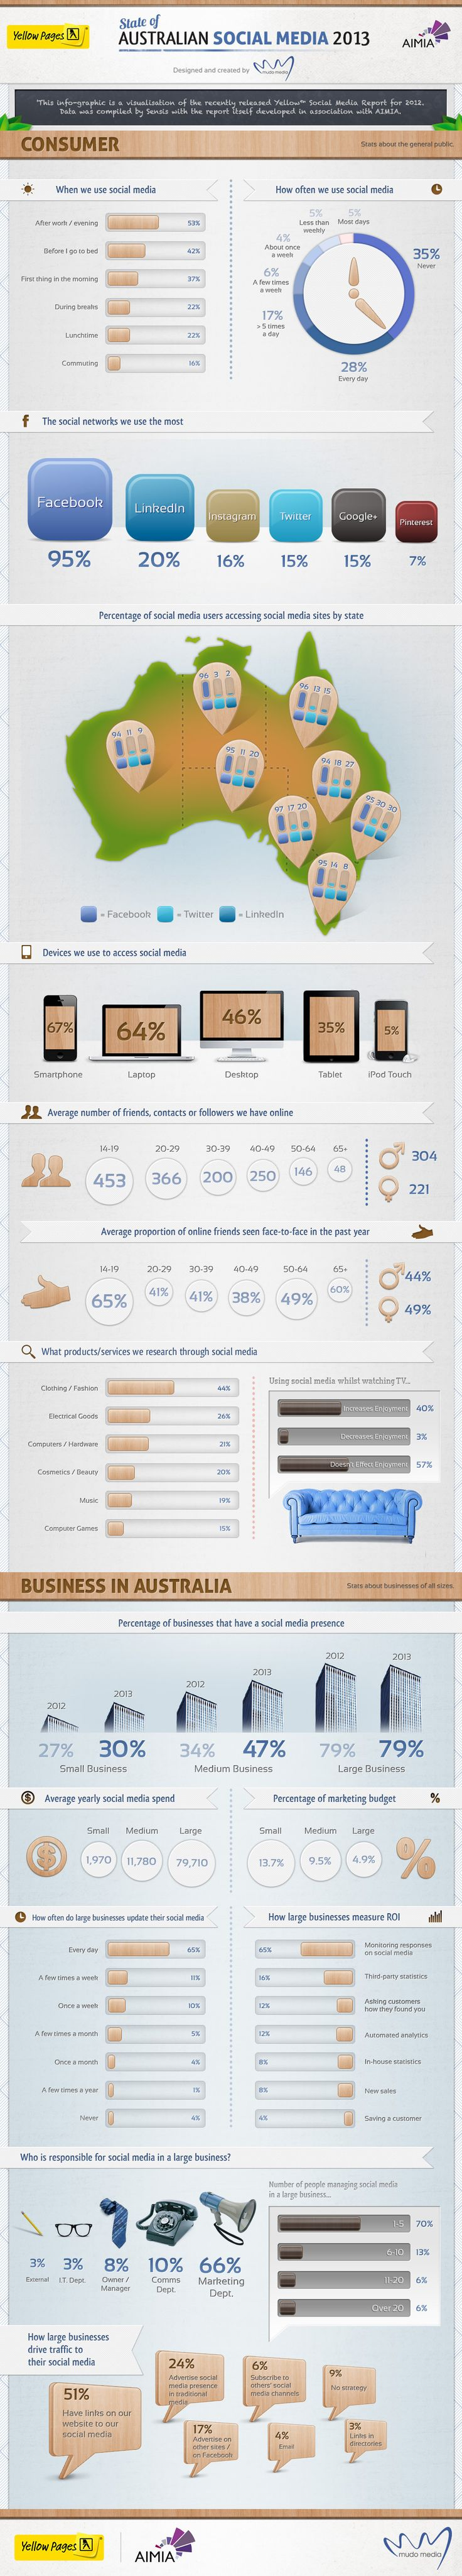 Social Media Usage in Australia 2013 Report INFOGRAPHIC